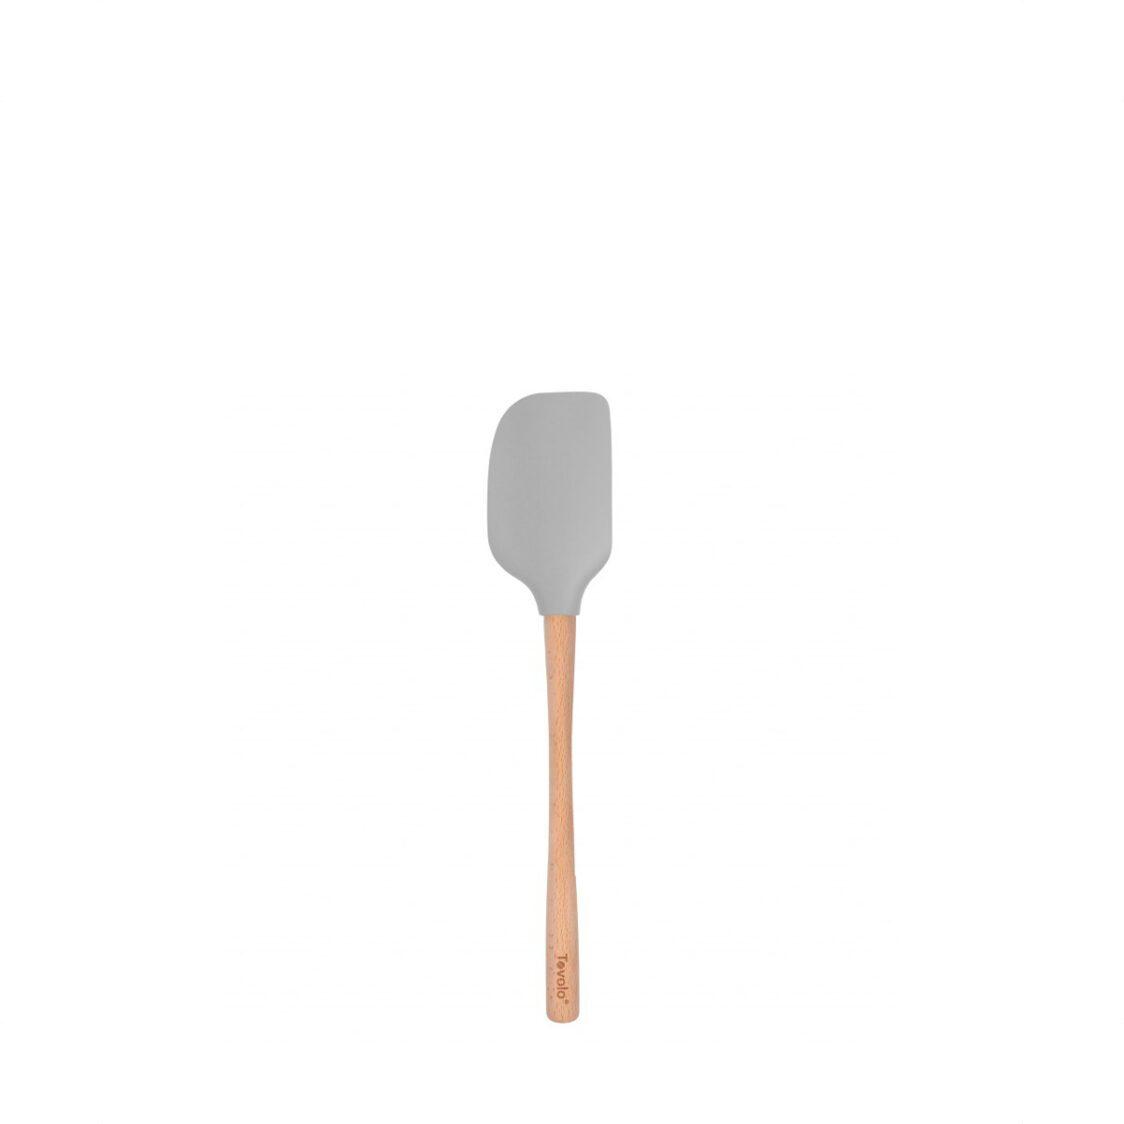 Tovolo Flex-Core Wood Handled Spatula Oyster Gray